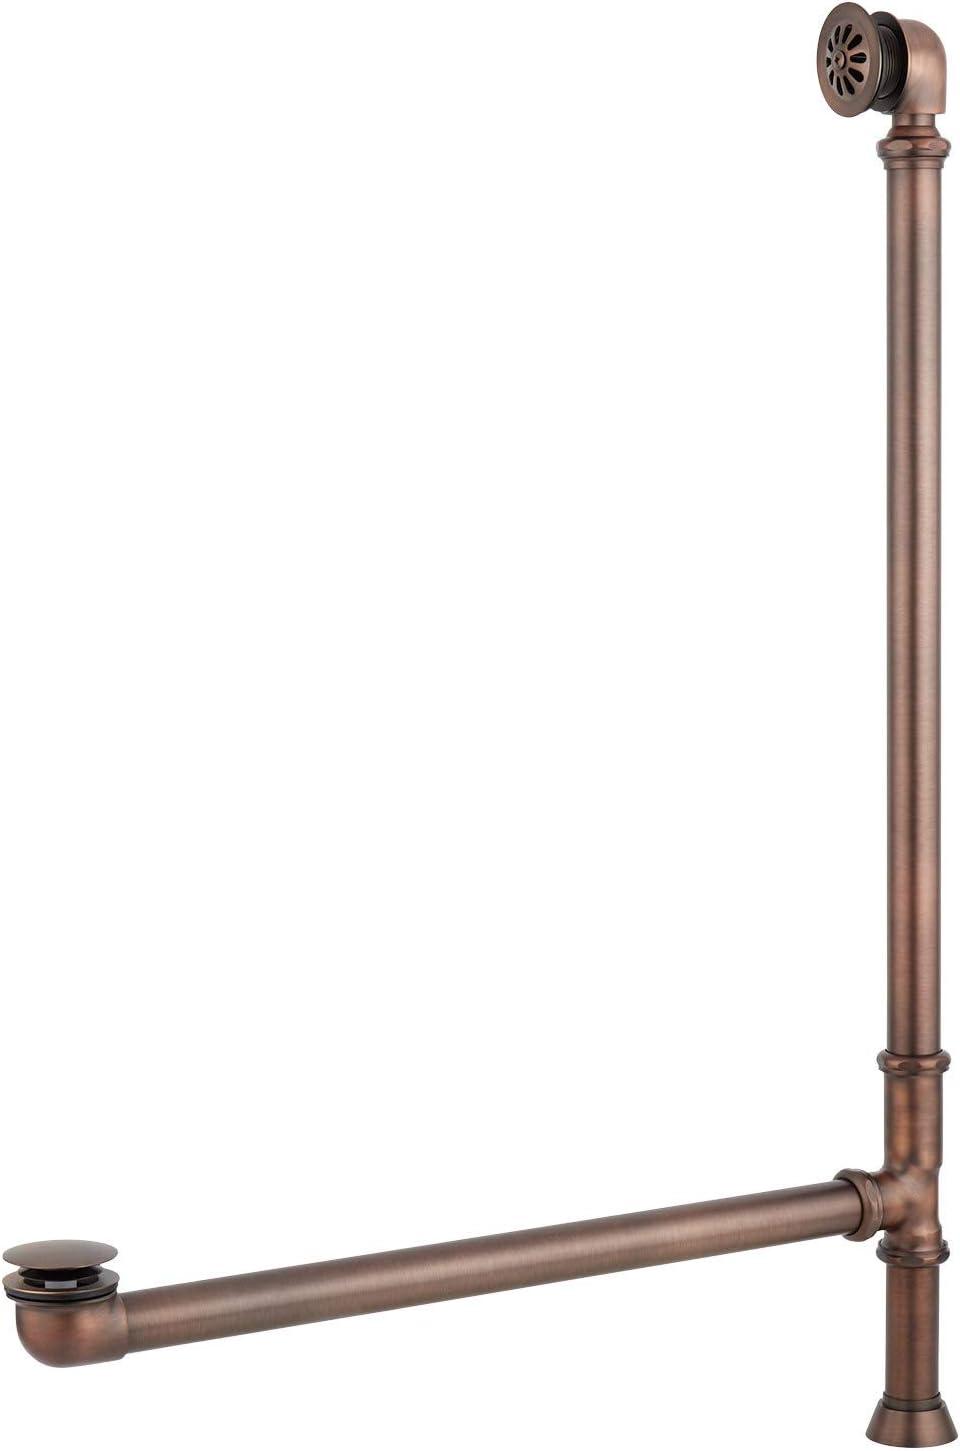 Signature Max Sales 45% OFF Hardware 946608-2375 Pop-Up Tub Swivel Drain Head with